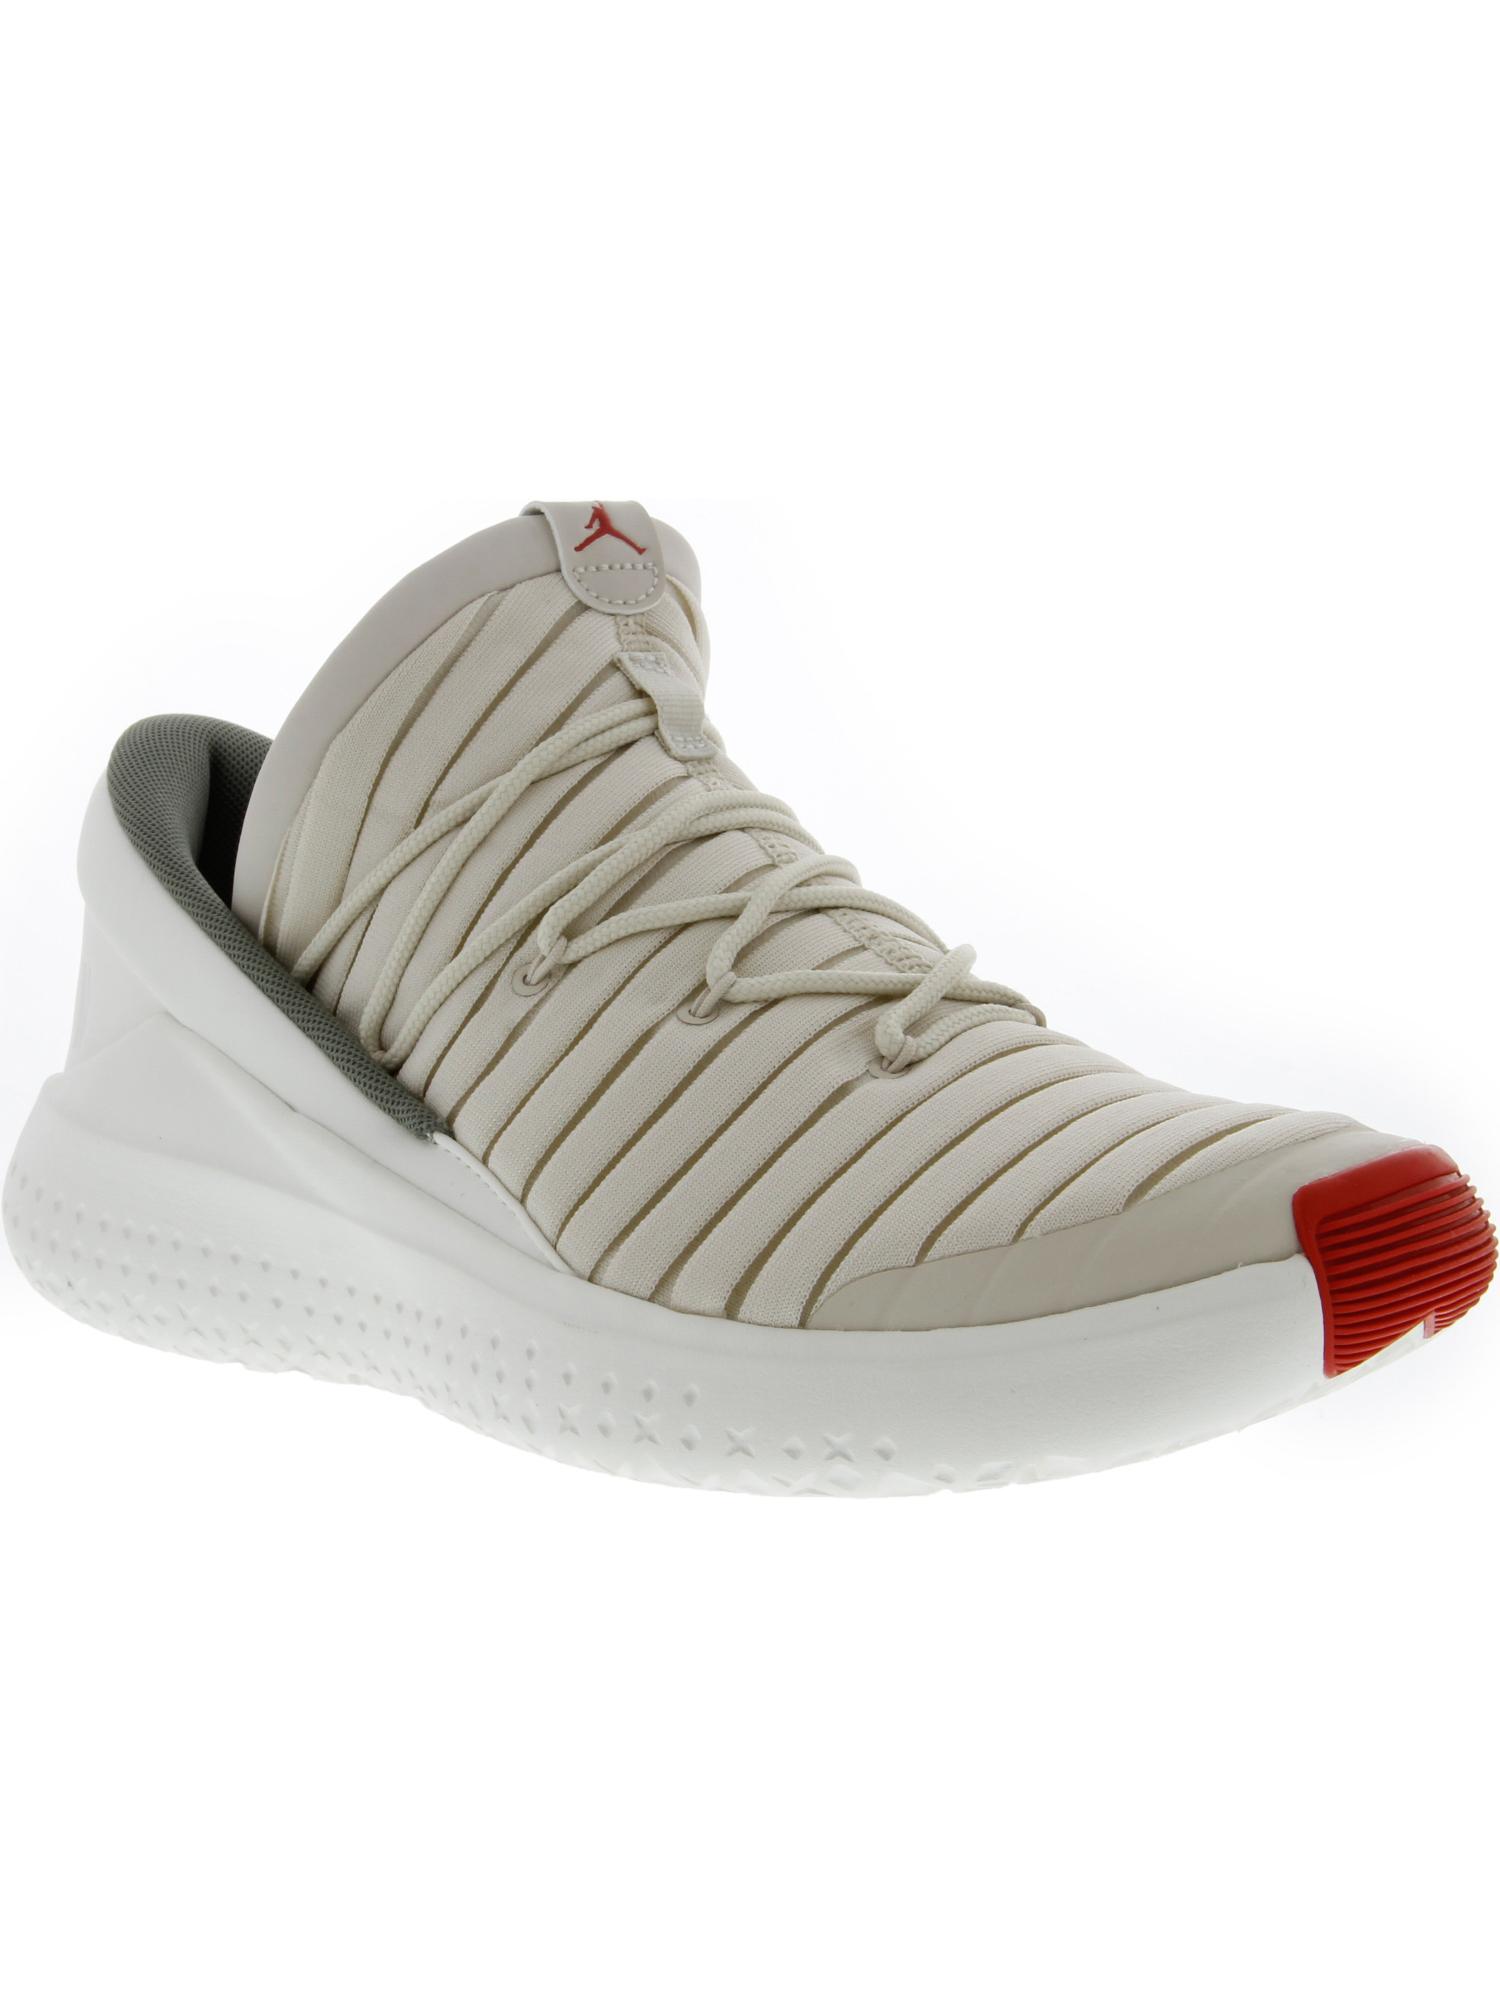 ce1c55f51ba0 Nike Jordan Flight Luxe Orewood Brown Men Casual Shoes SNEAKERS ...